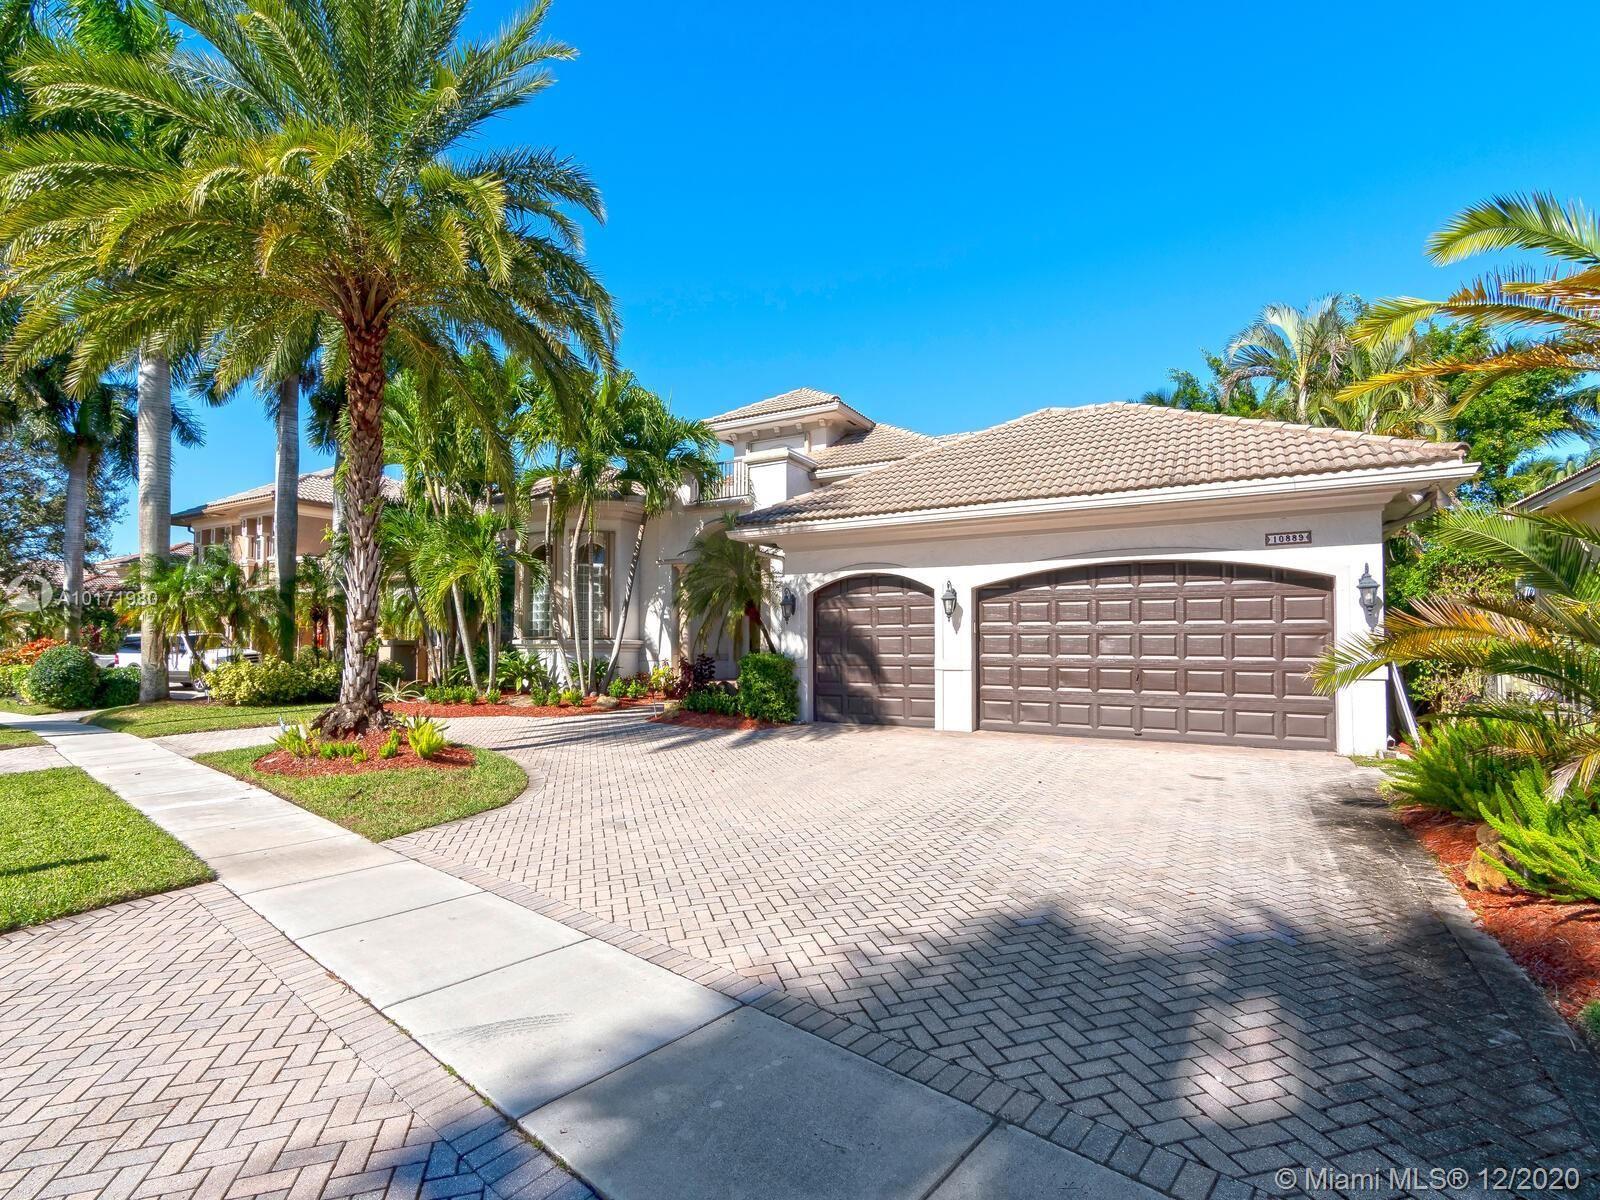 10889 Blue Palm St, Plantation, FL 33324 - #: A10171980